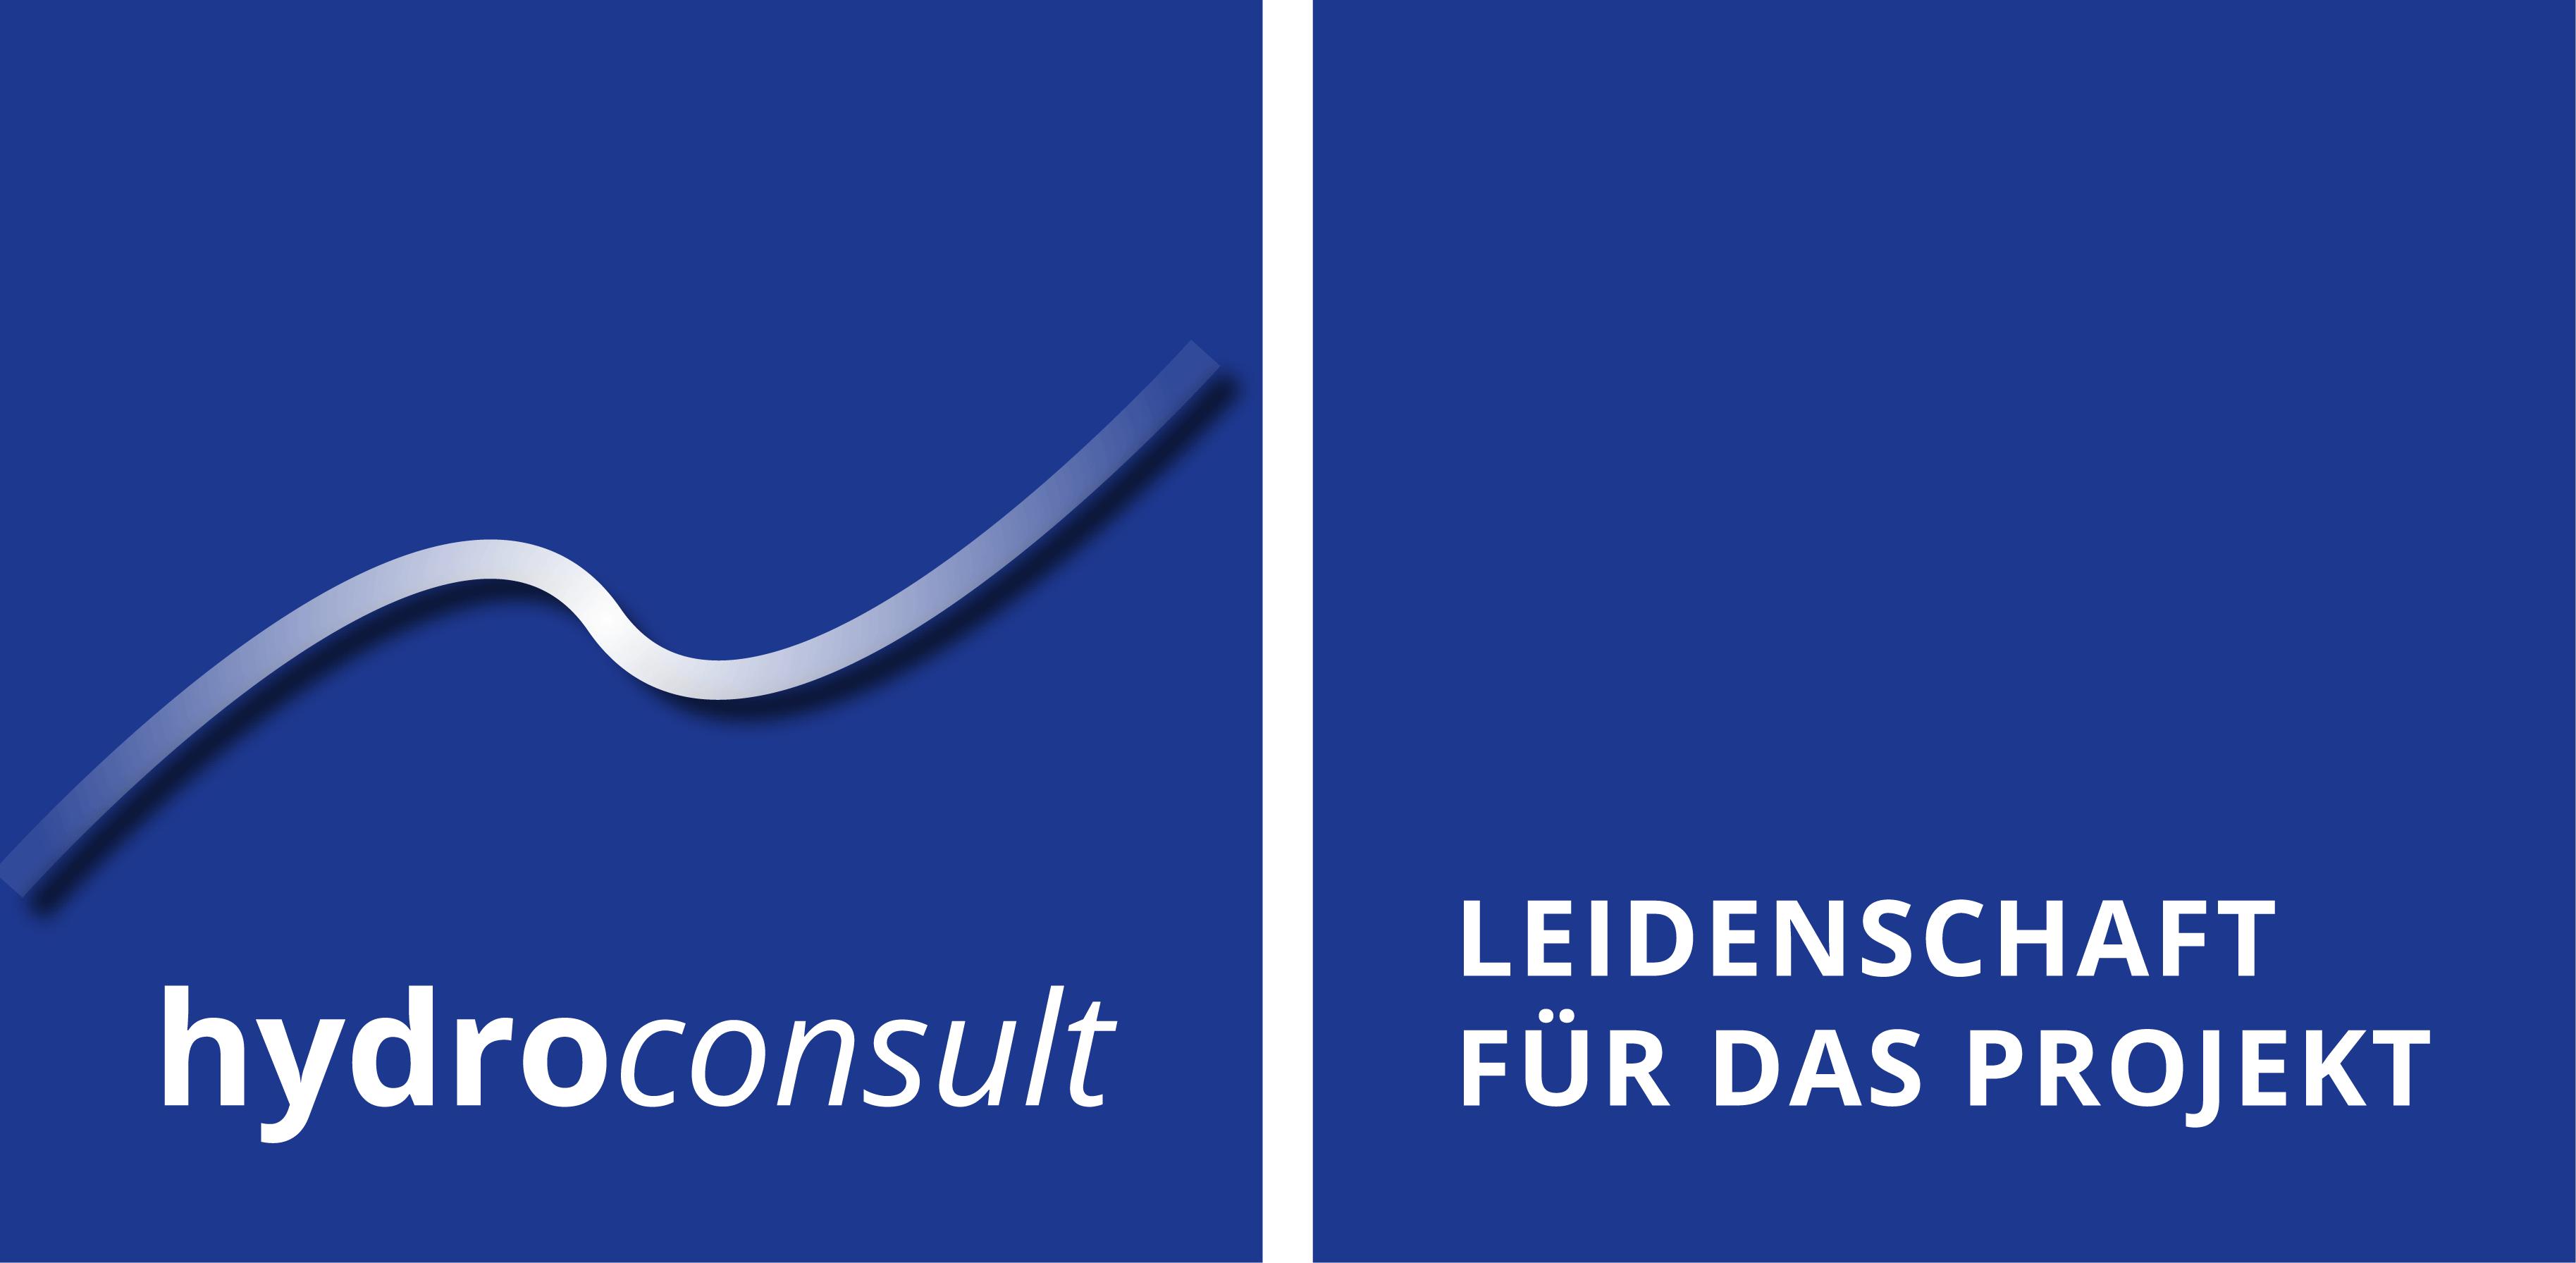 Hydroconsult GmbH